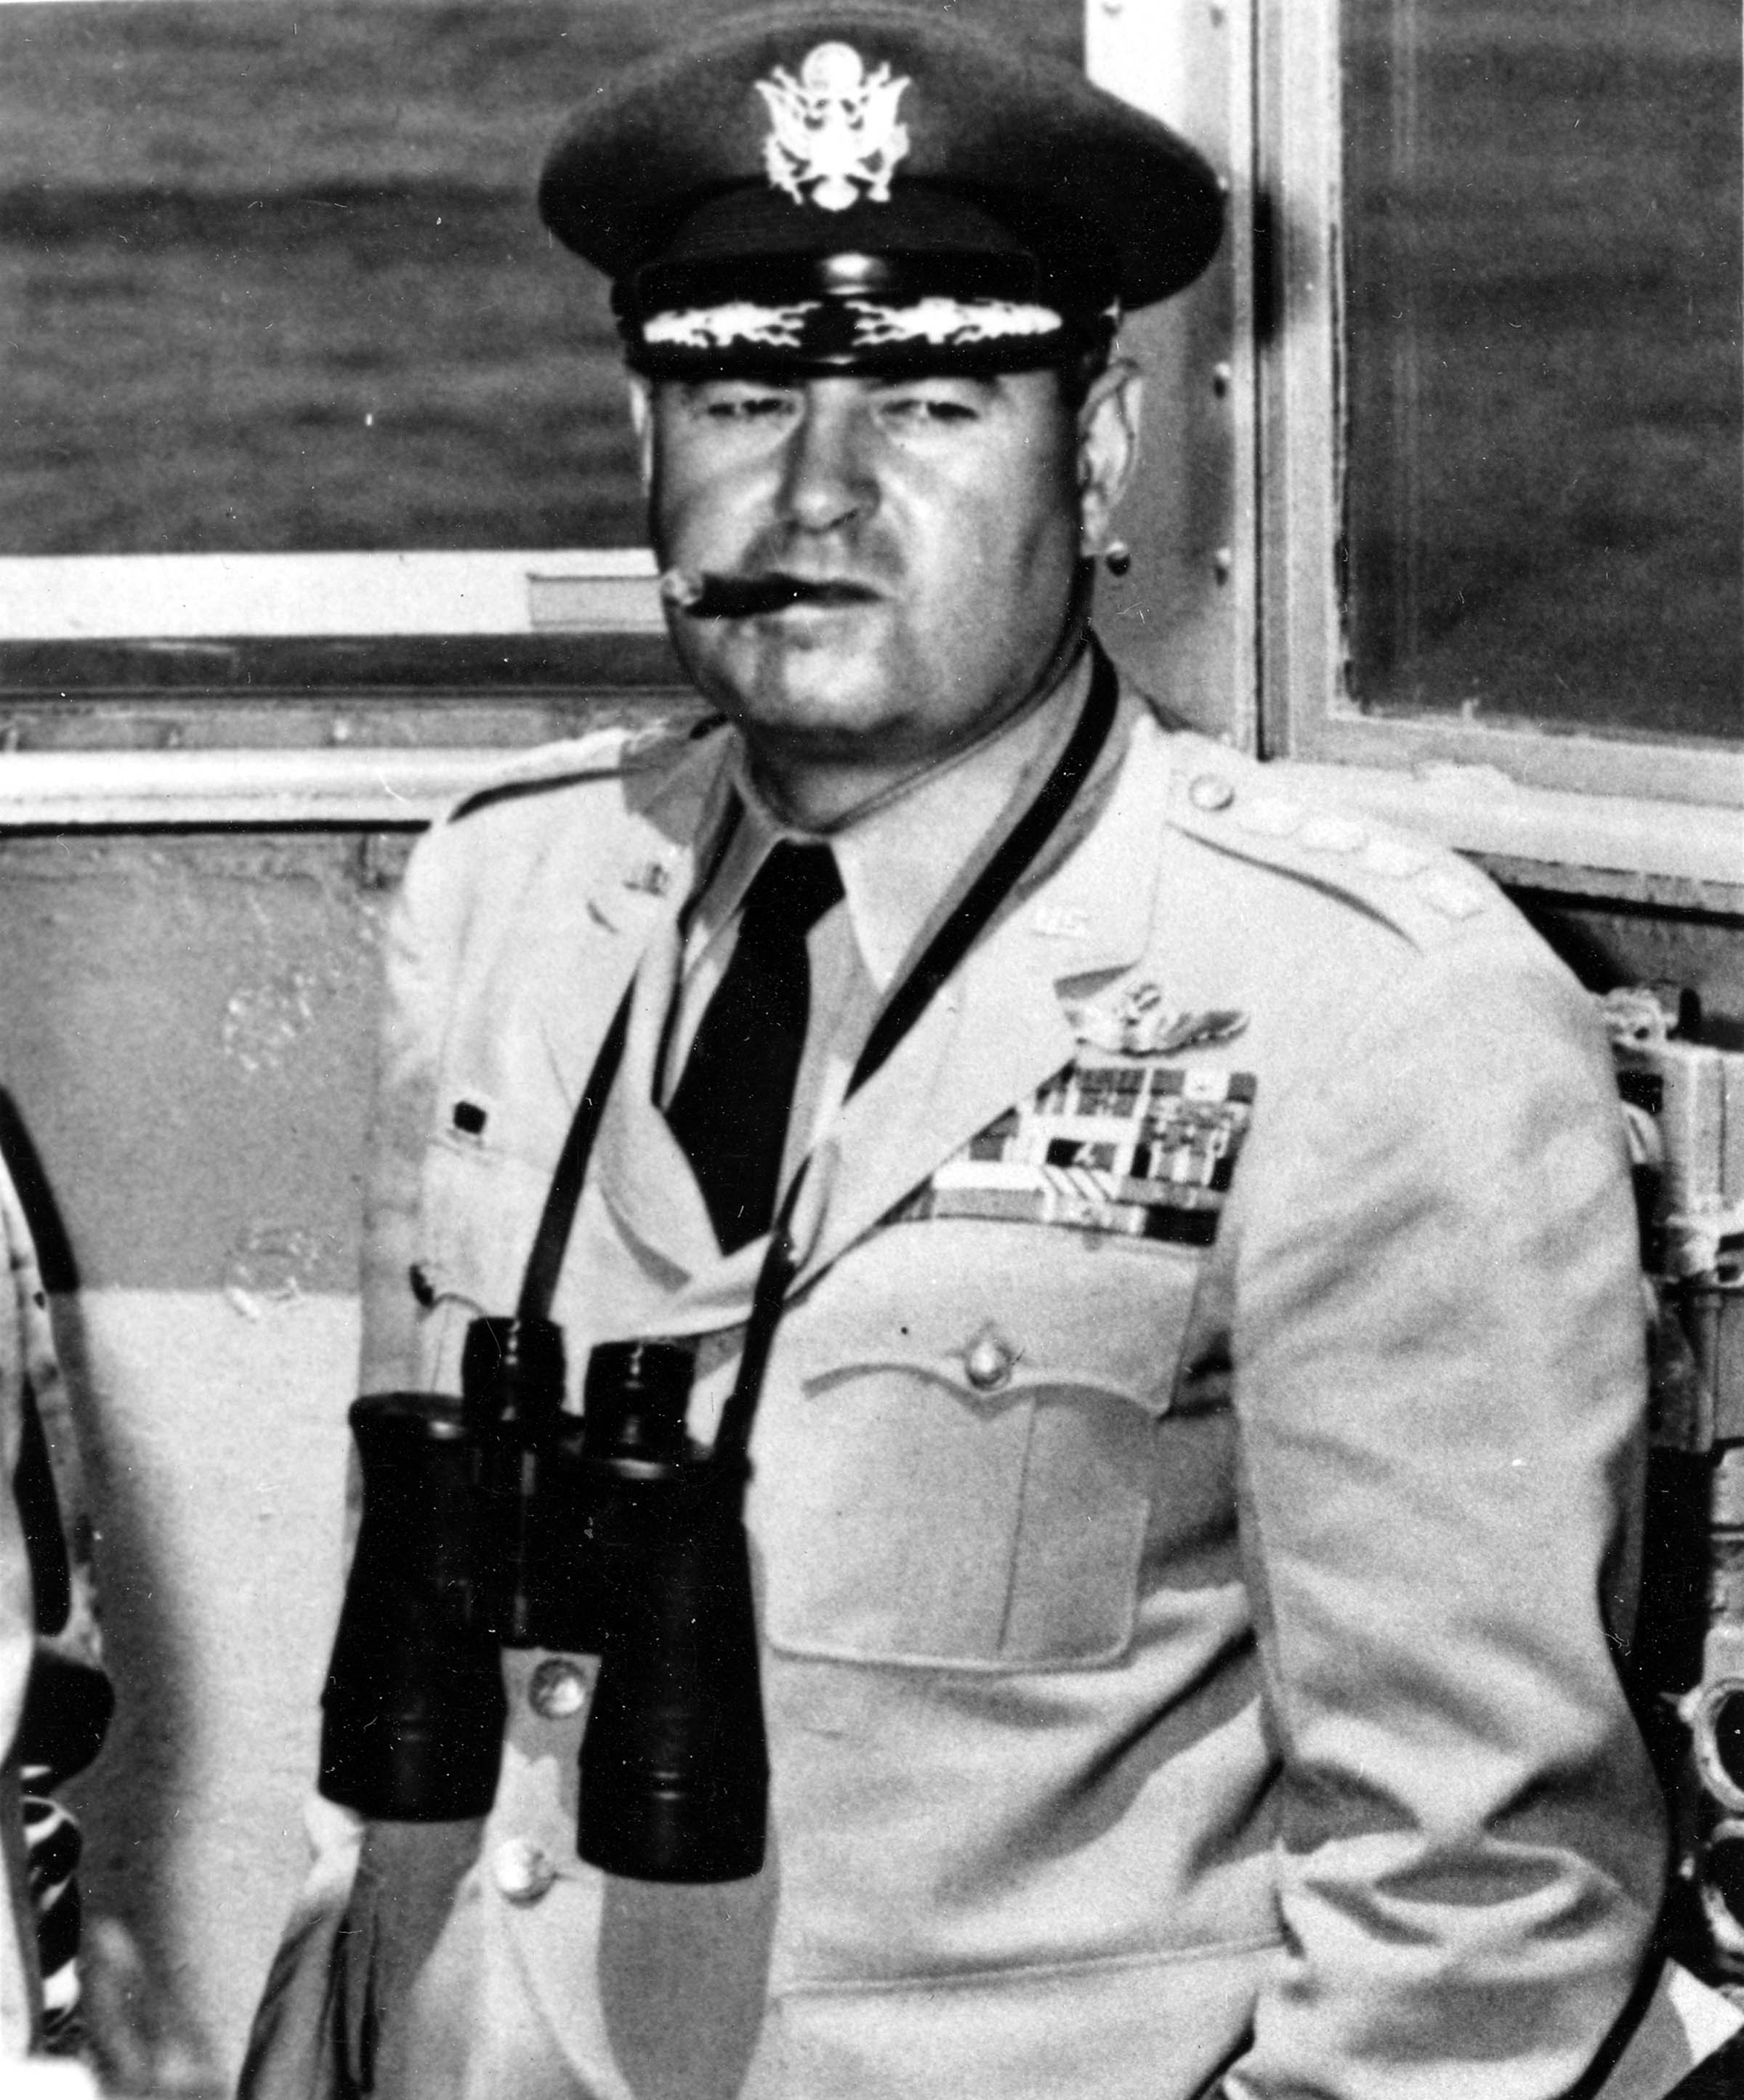 General Curtis LeMay SAC Commander 1947-1957